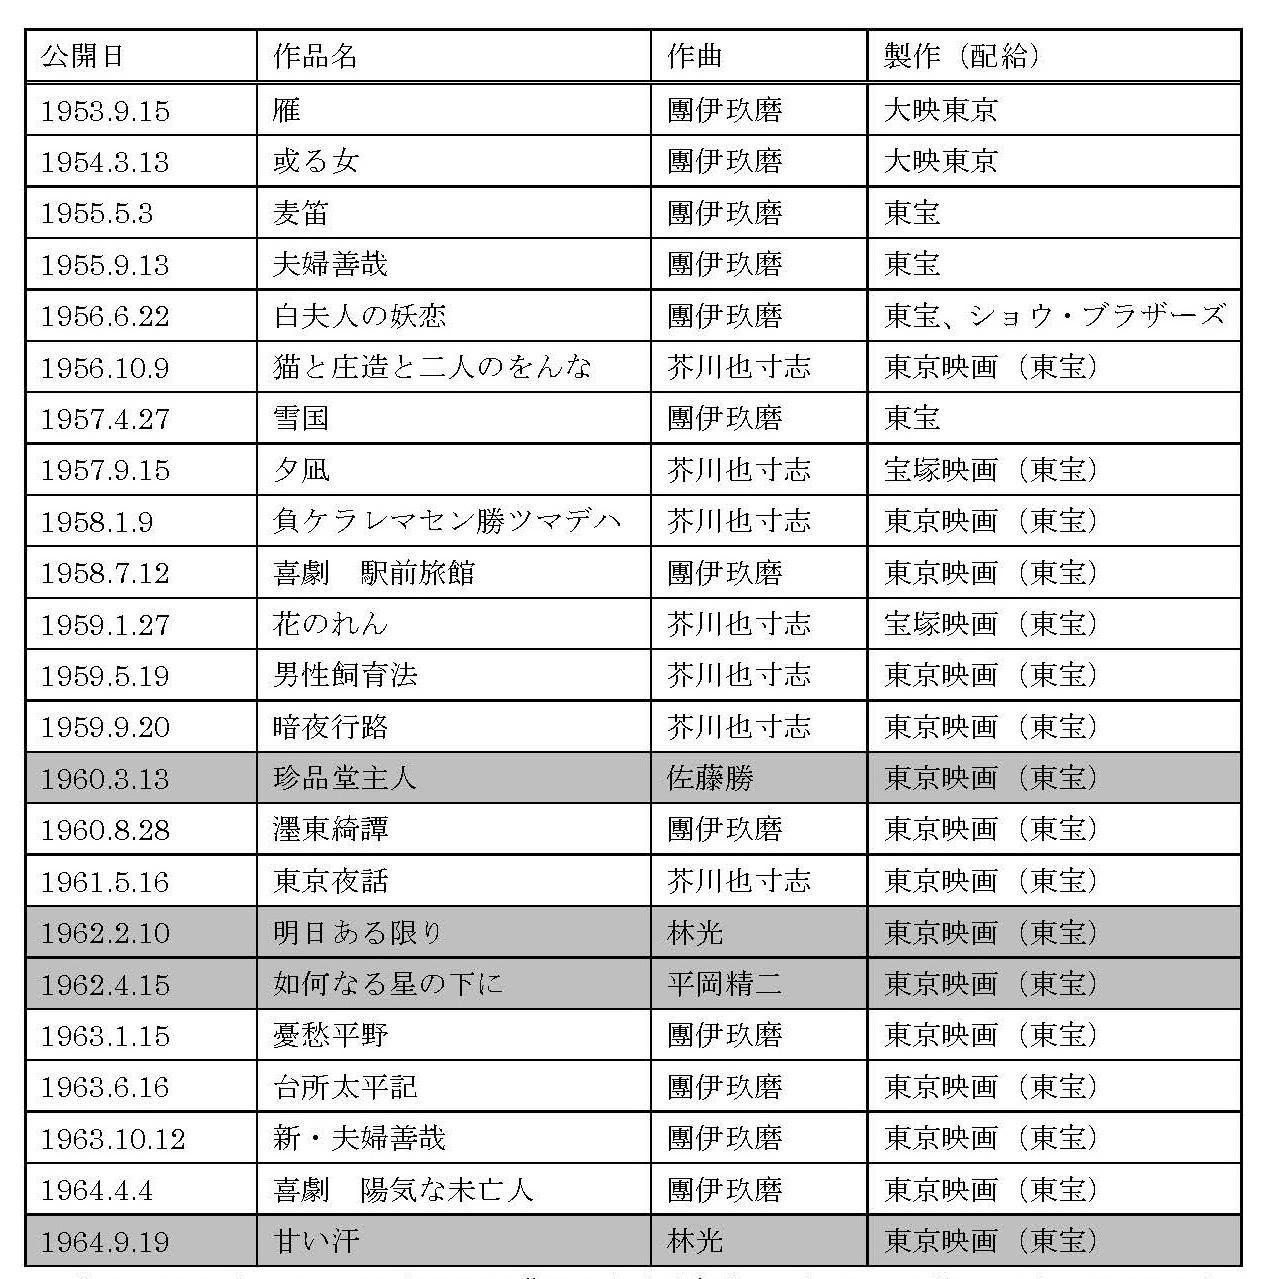 REPRE36研究ノート原稿_藤原_表2_キャプションなし.jpg